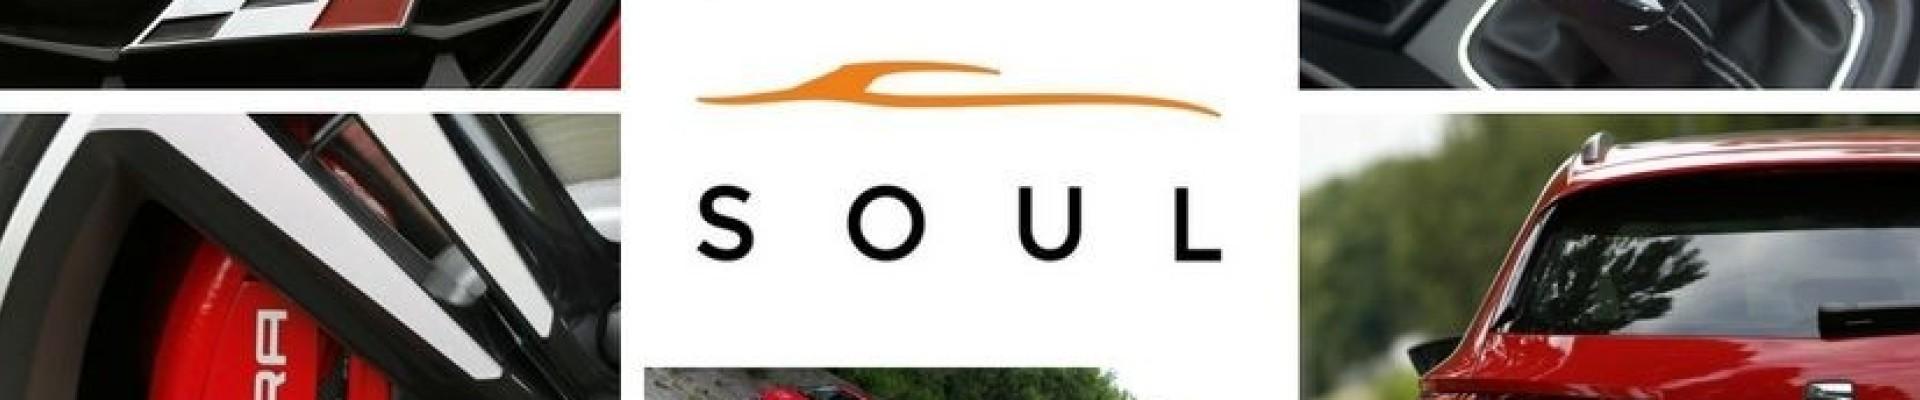 Motosoul